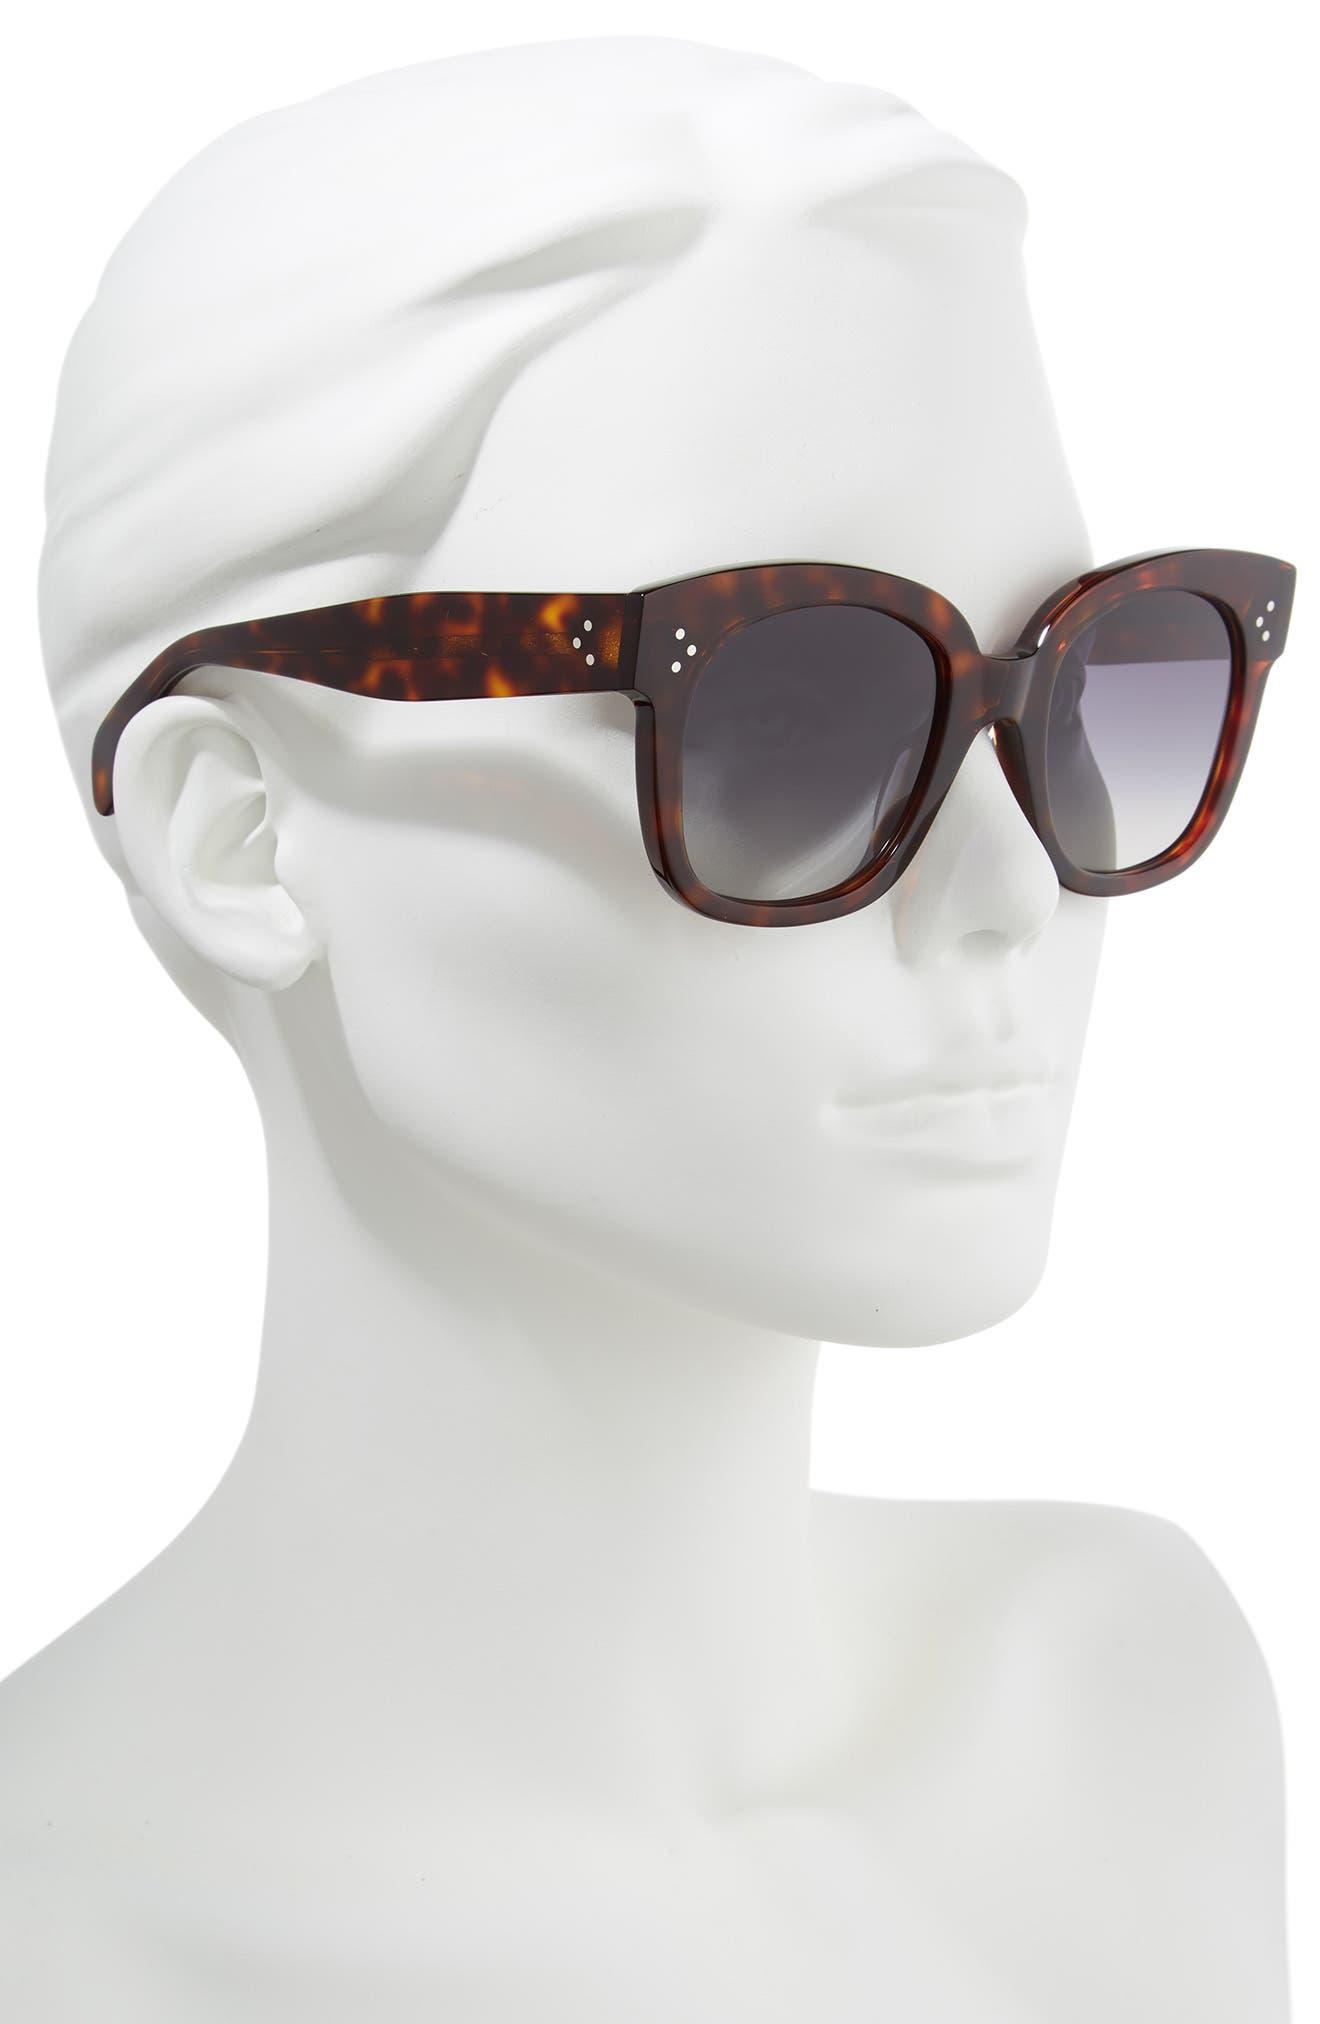 54mm Square Sunglasses,                             Alternate thumbnail 3, color,                             RED HAVAN/ SMOKE